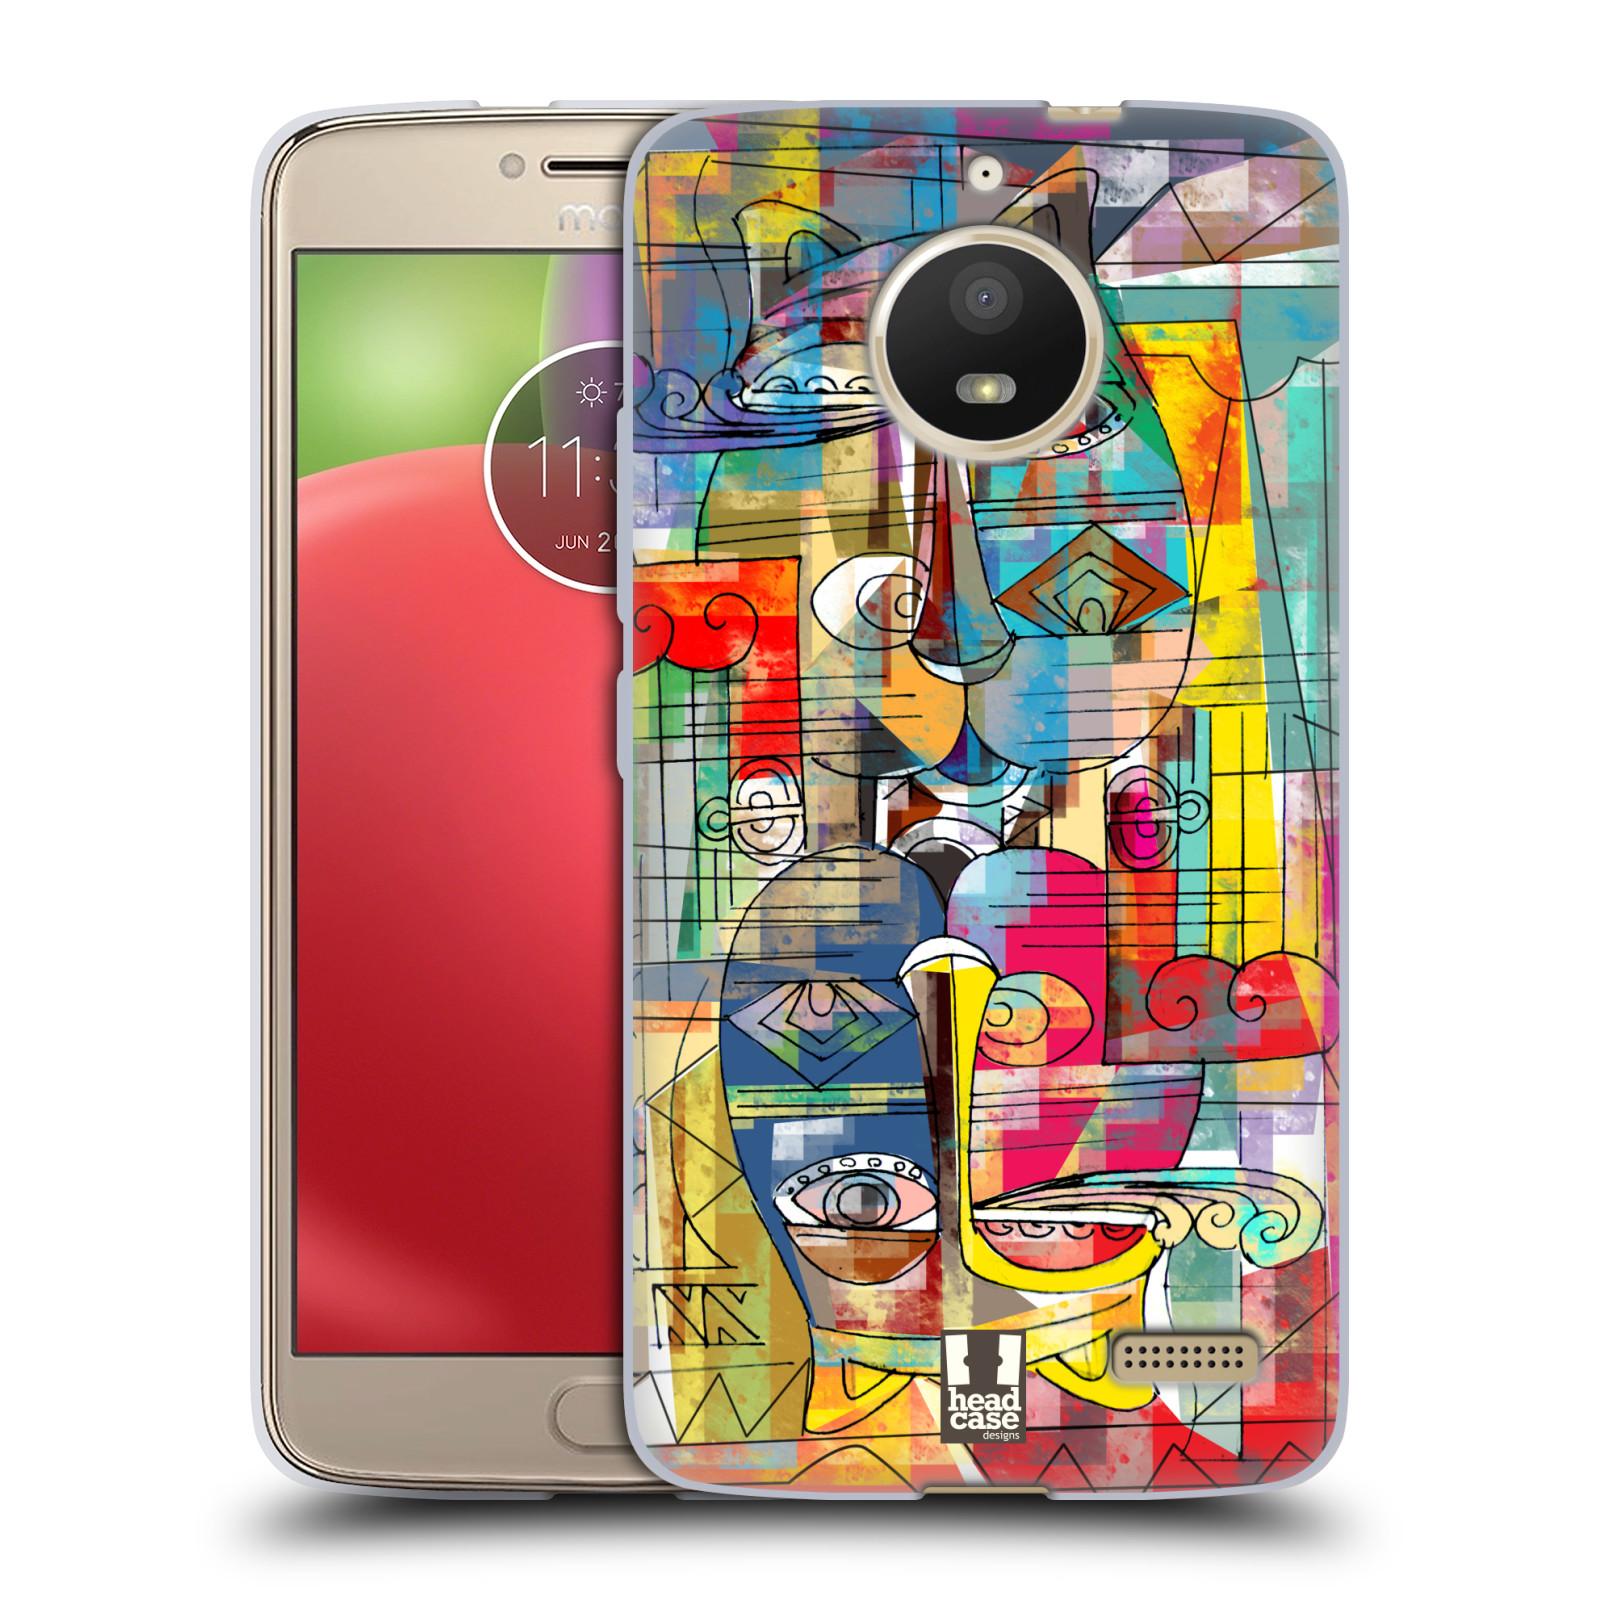 Silikonové pouzdro na mobil Lenovo Moto E4 - Head Case - AZTEC MANX